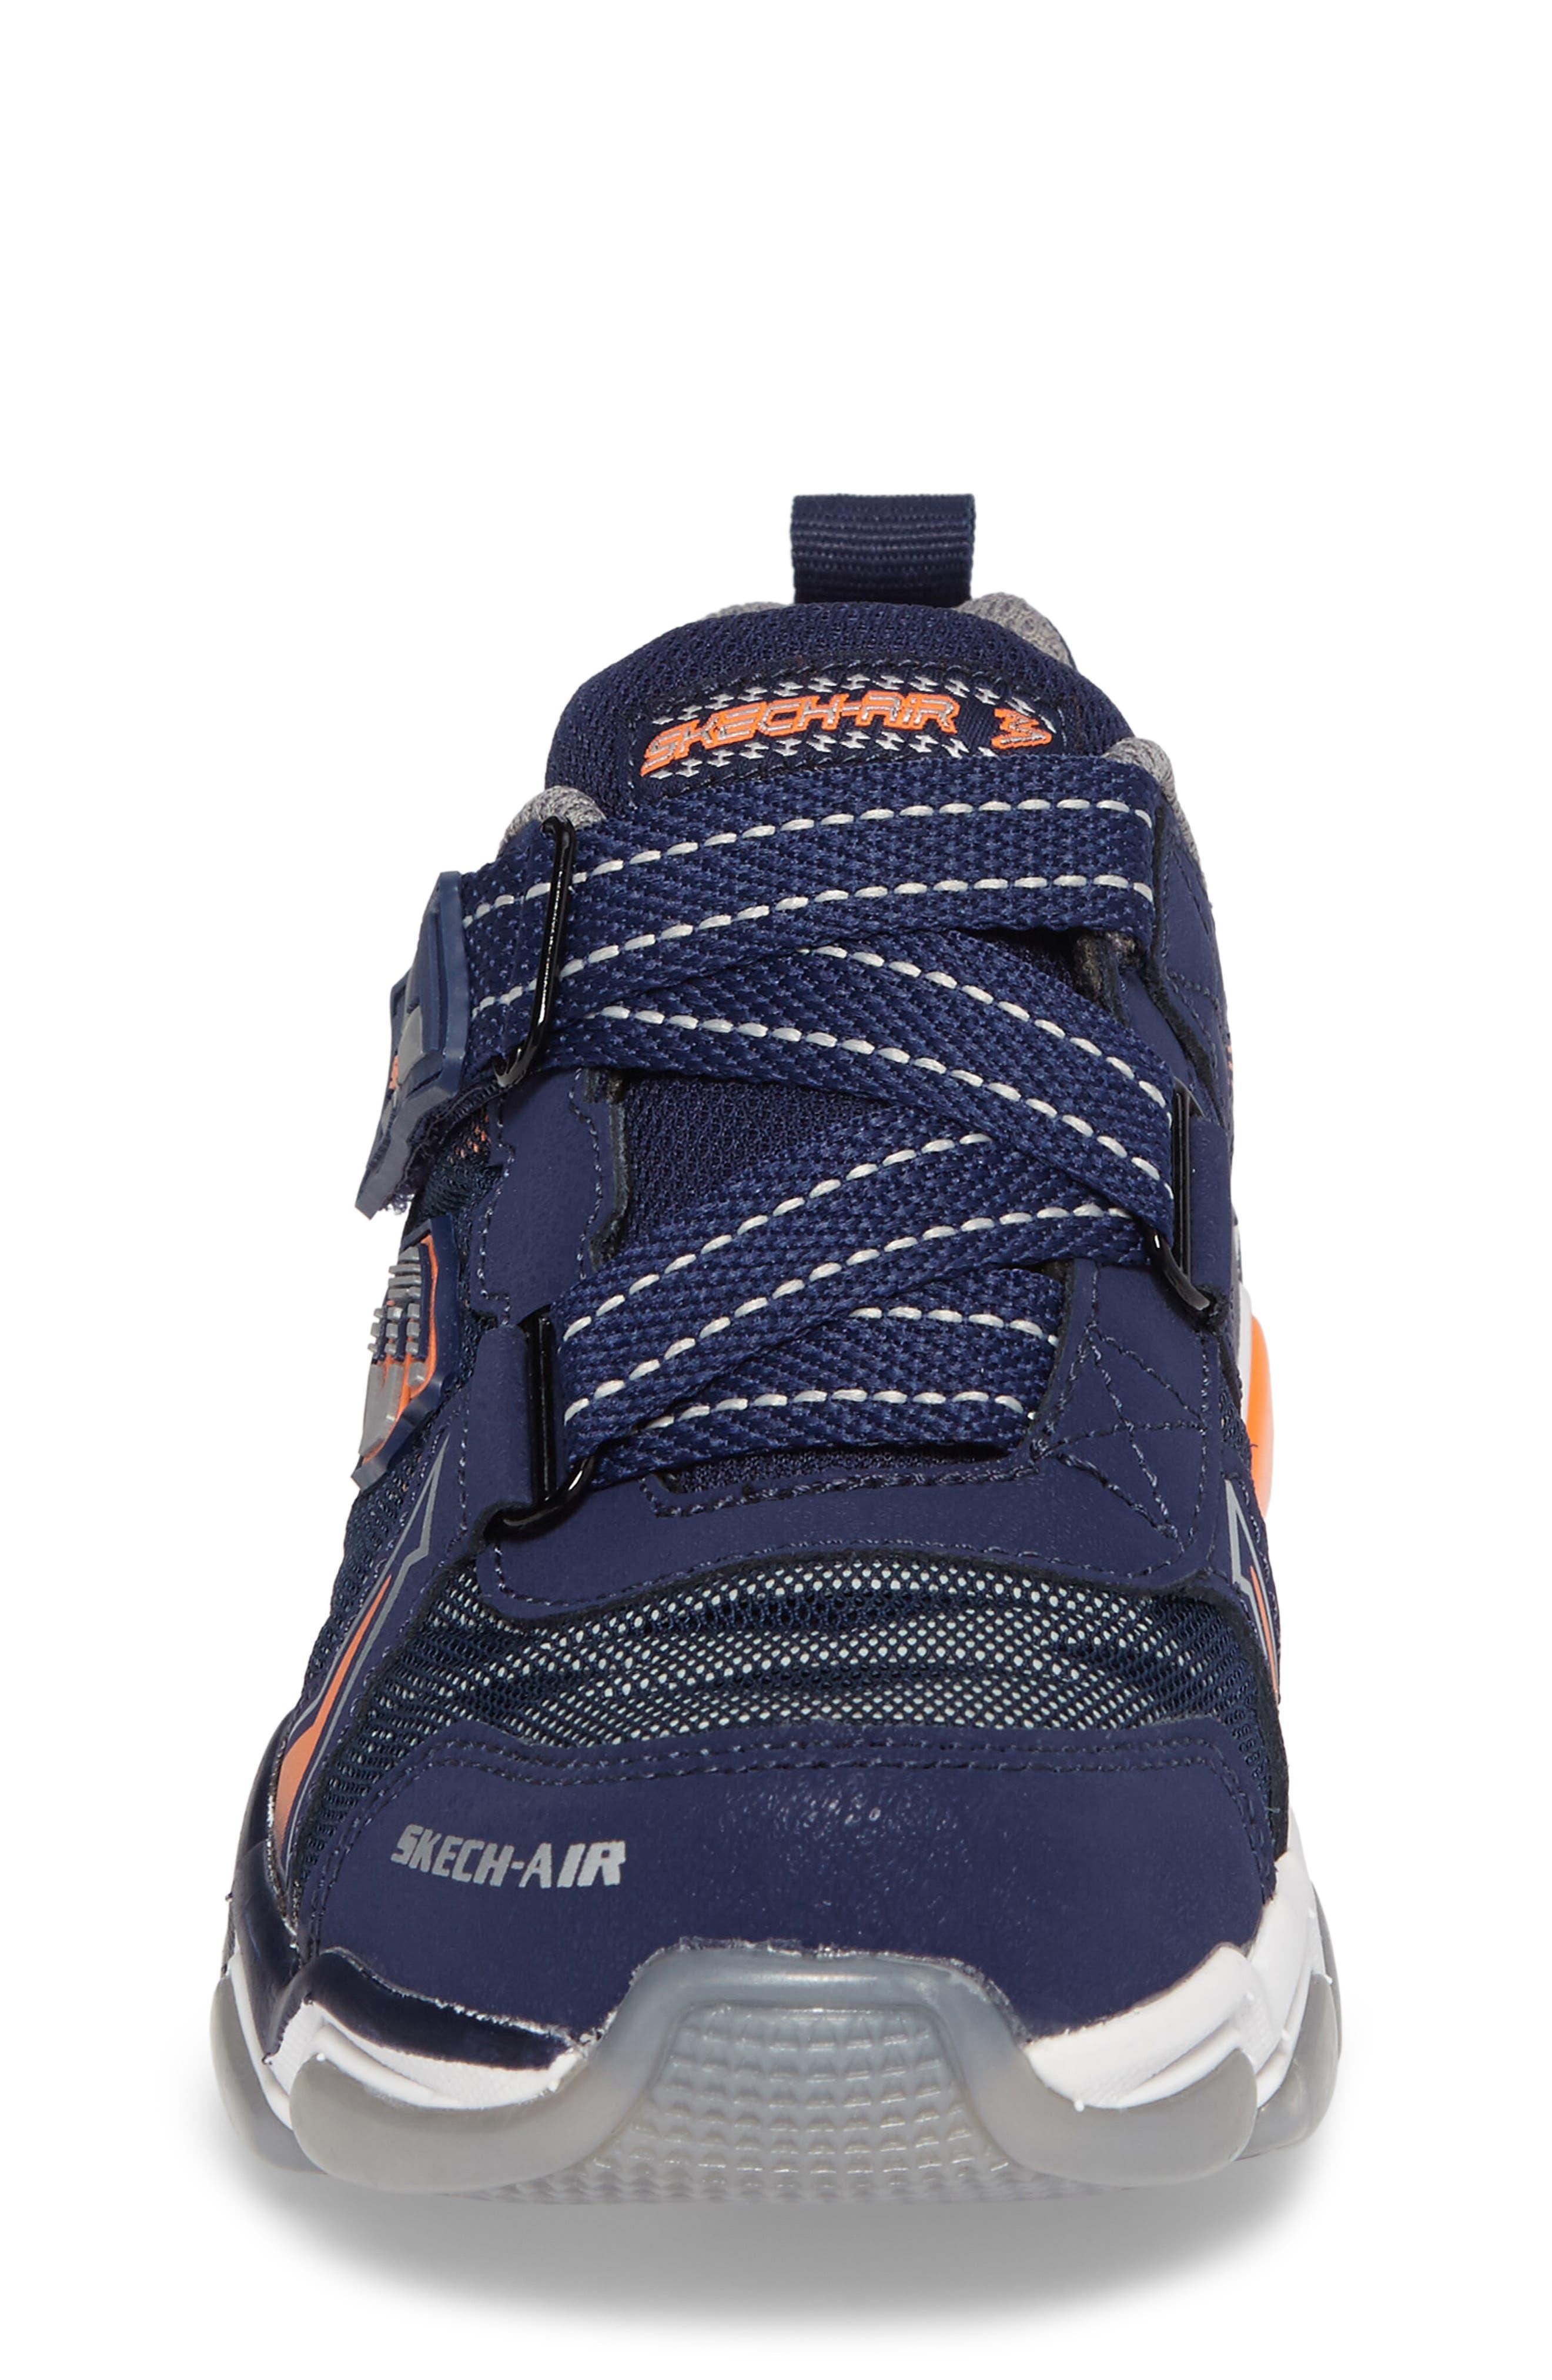 Skech-Air 3.0 Downswitch Sneaker,                             Alternate thumbnail 4, color,                             Navy/ Orange